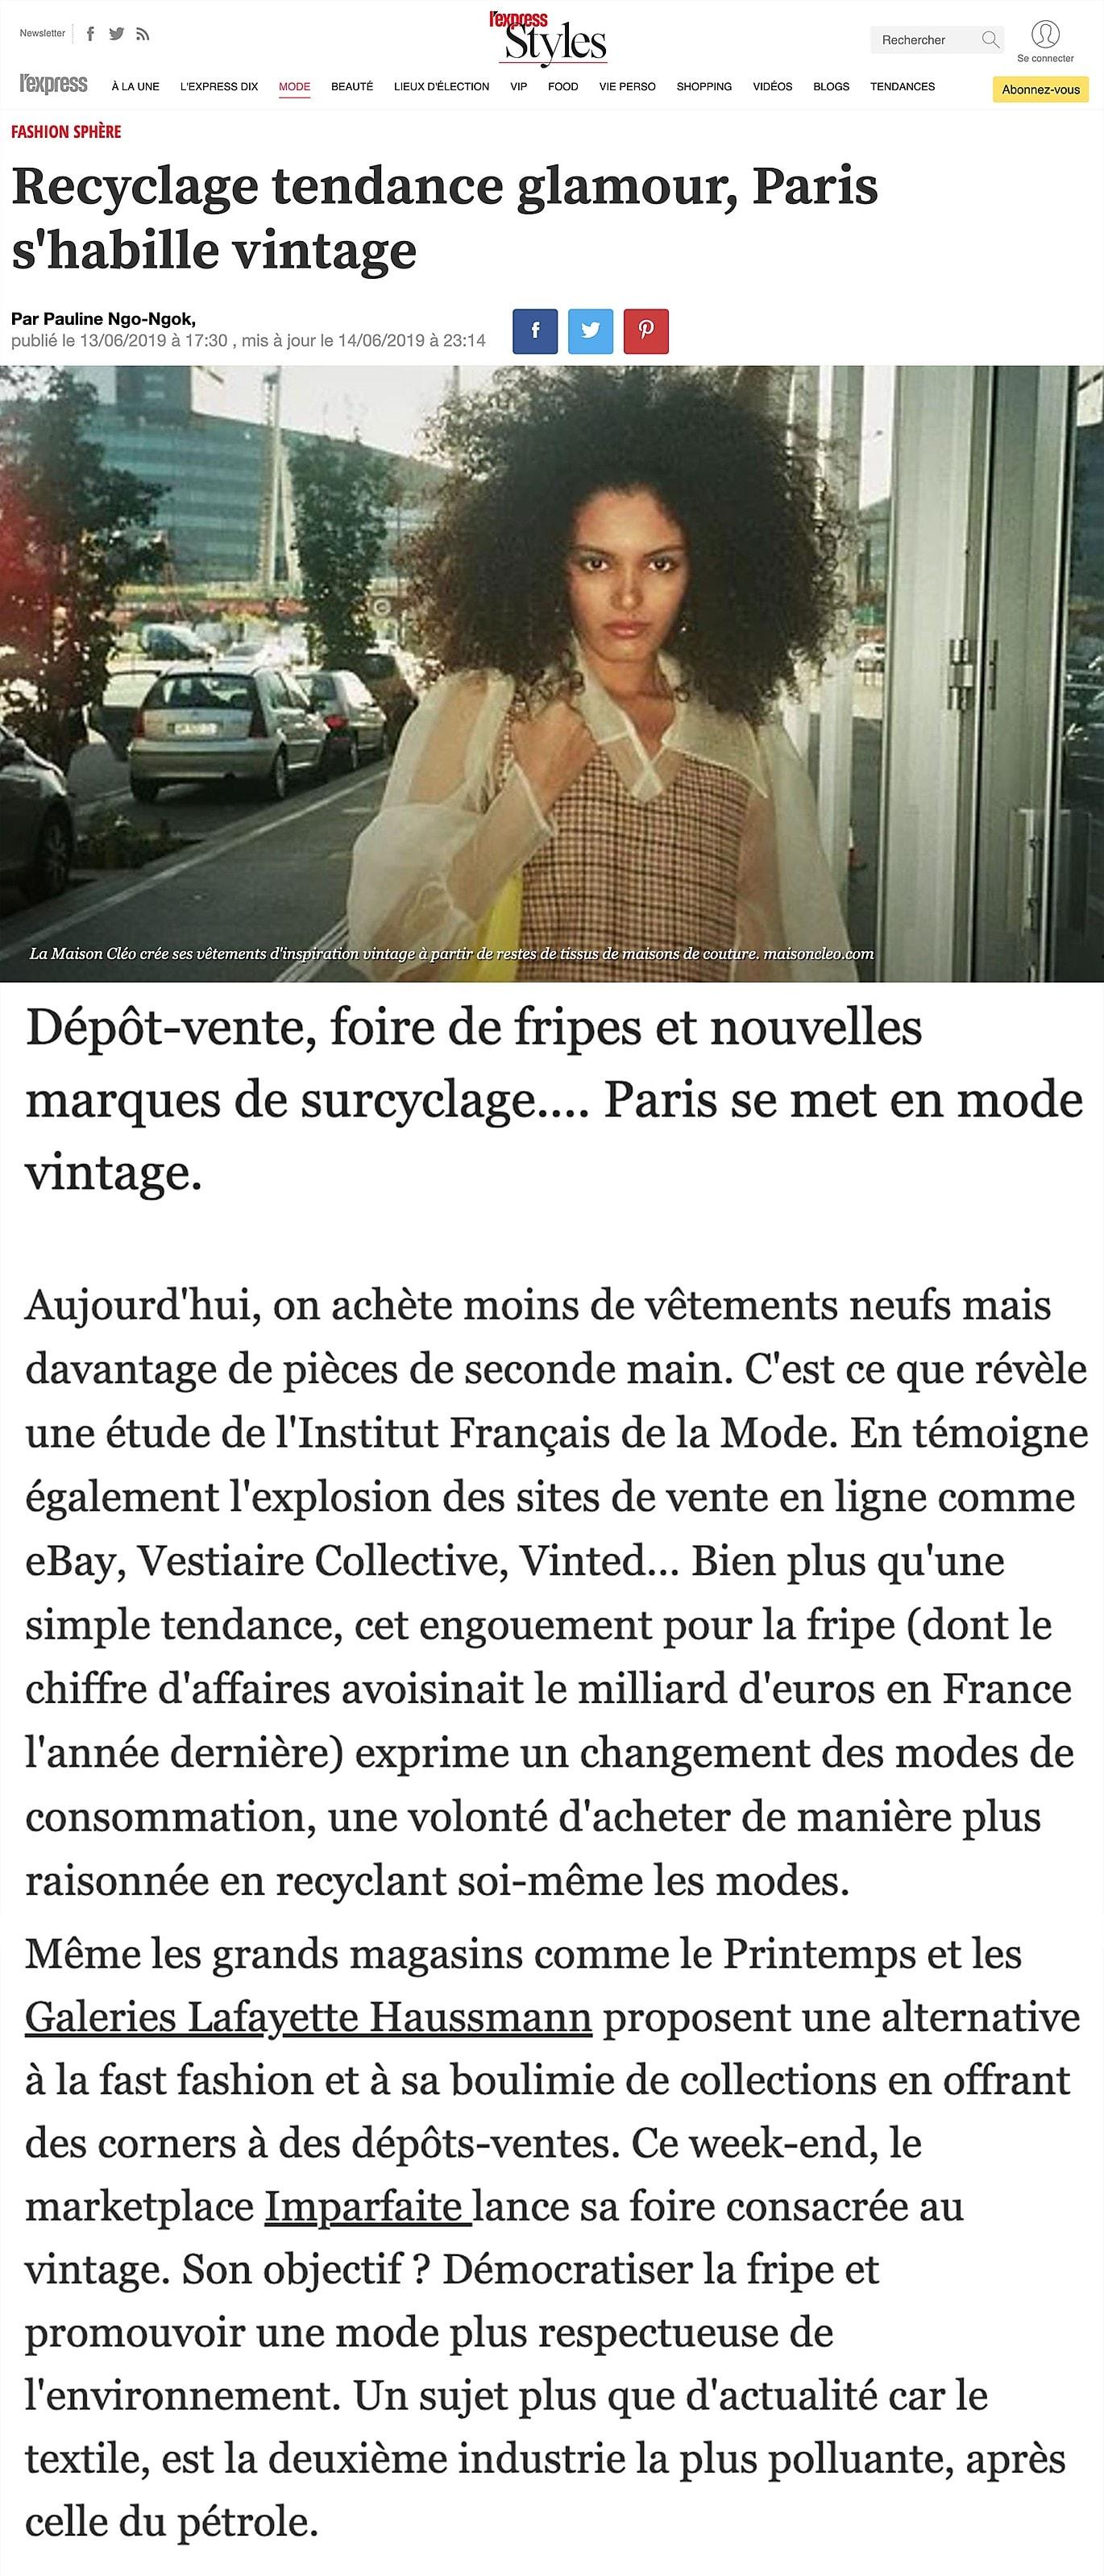 l'express / MaisonCléo